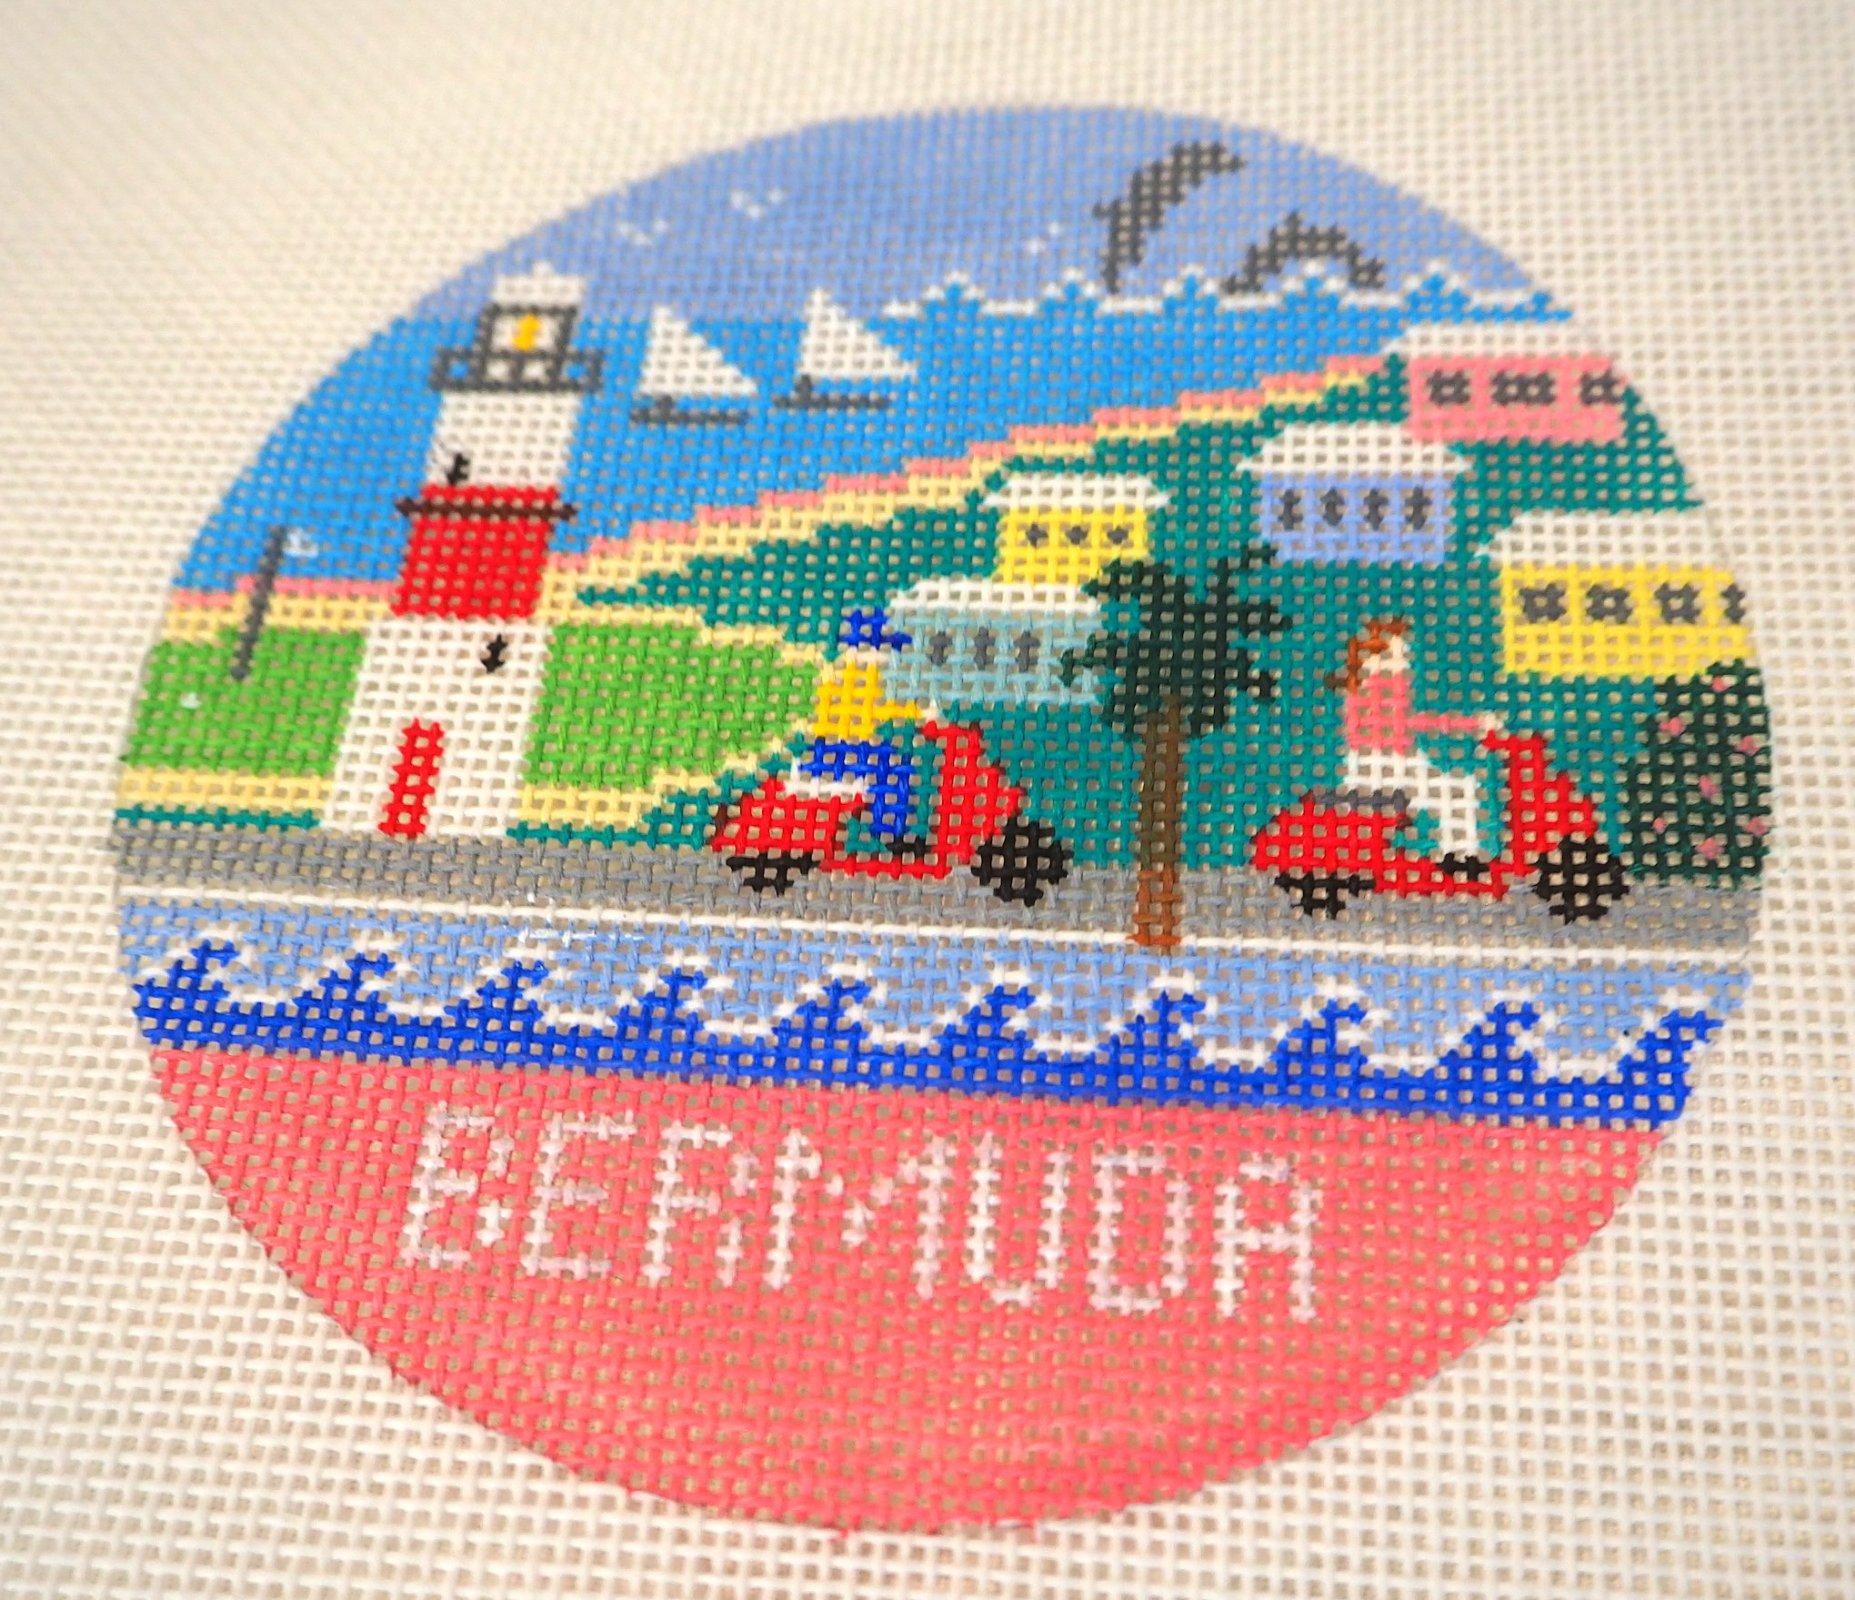 Bermuda Round, R-333